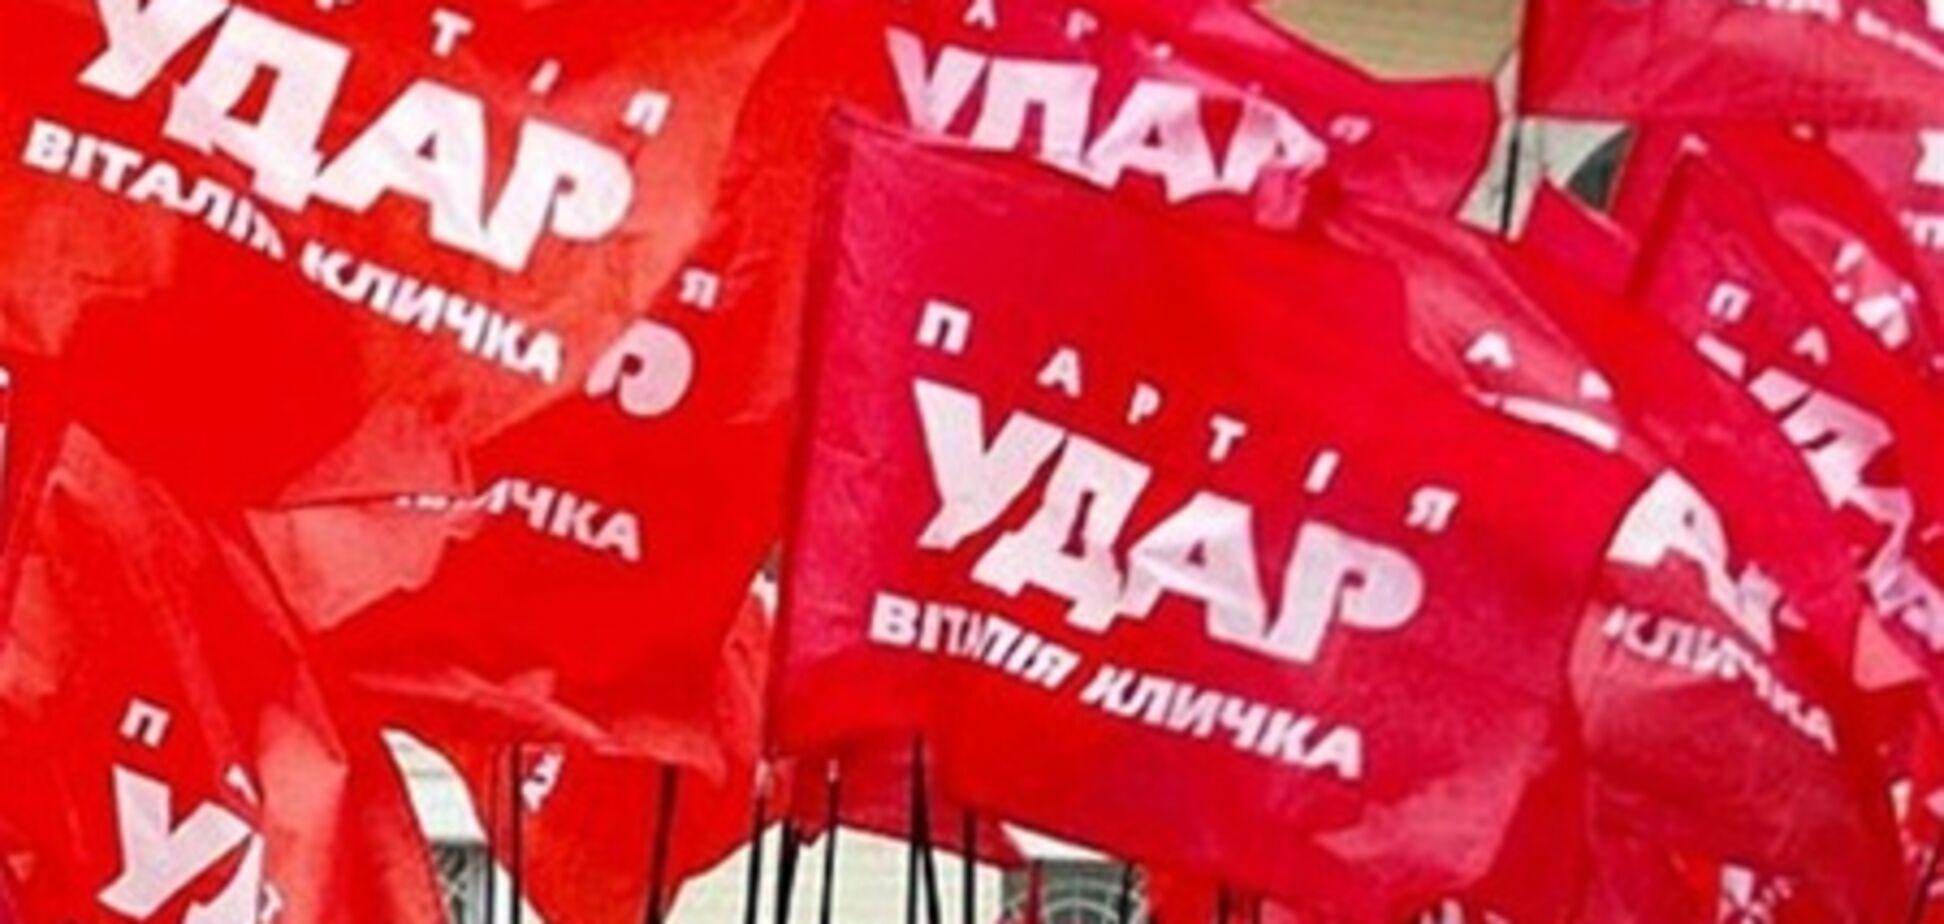 УДАР задолжал своим активистам $5 тыс. – СМИ